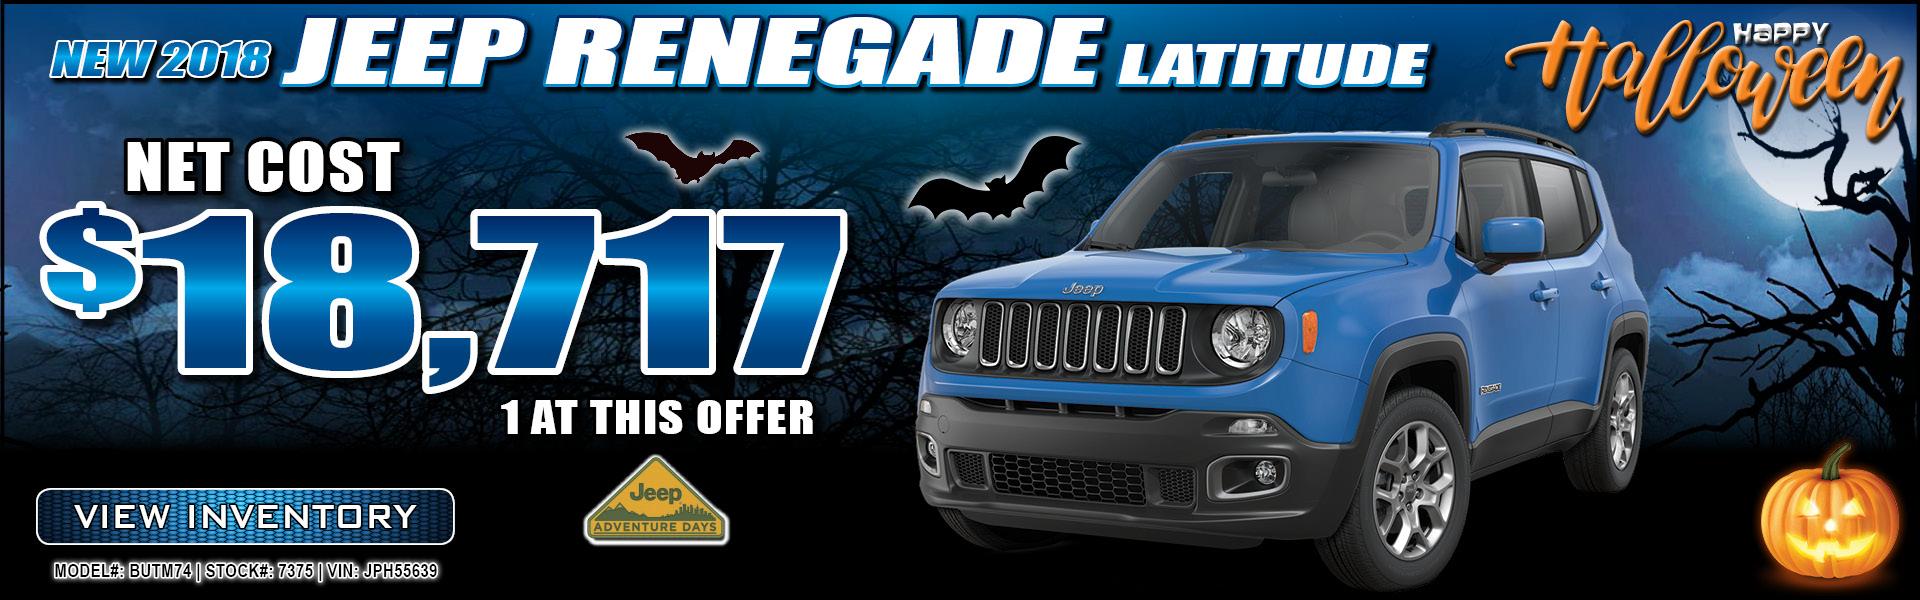 Jeep Renegade $18,717